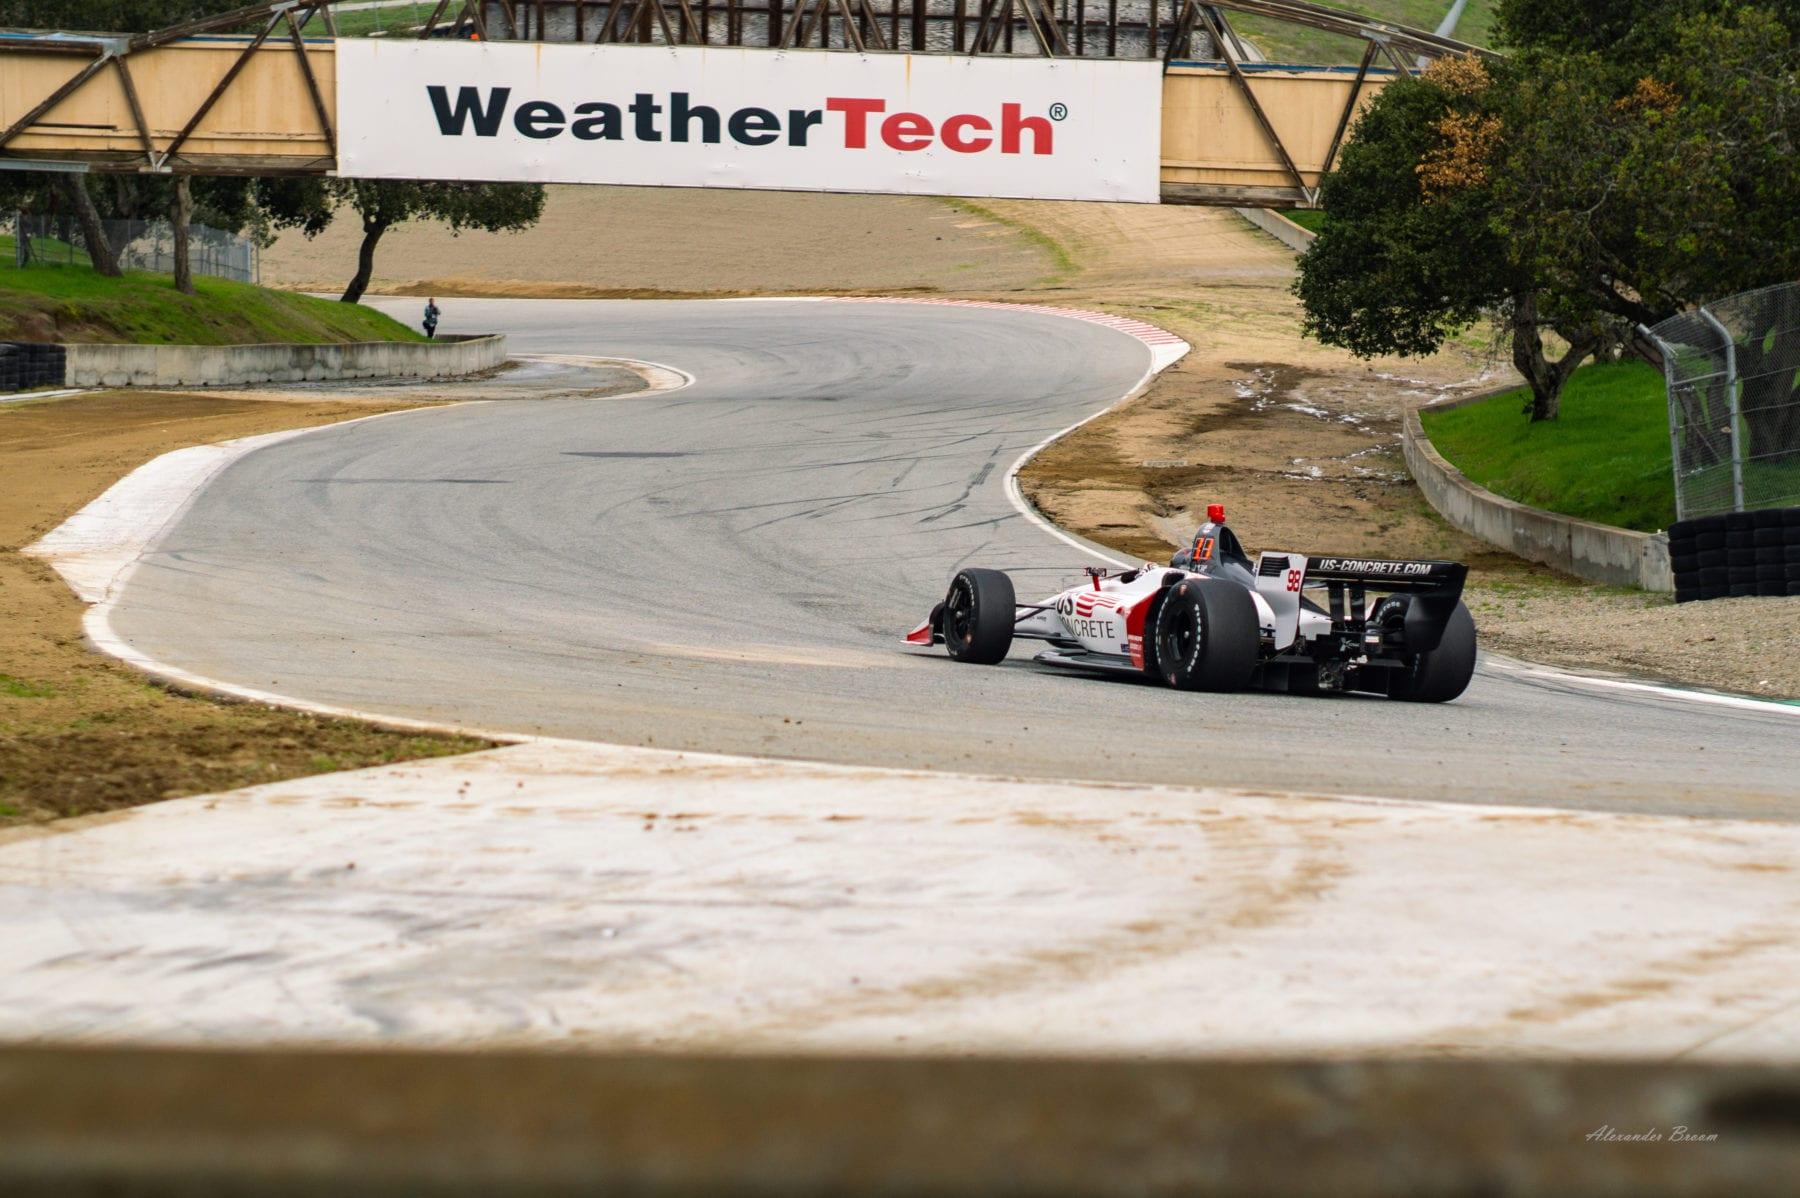 IndyCar Testing at WeatherTech Raceway Laguna Seca